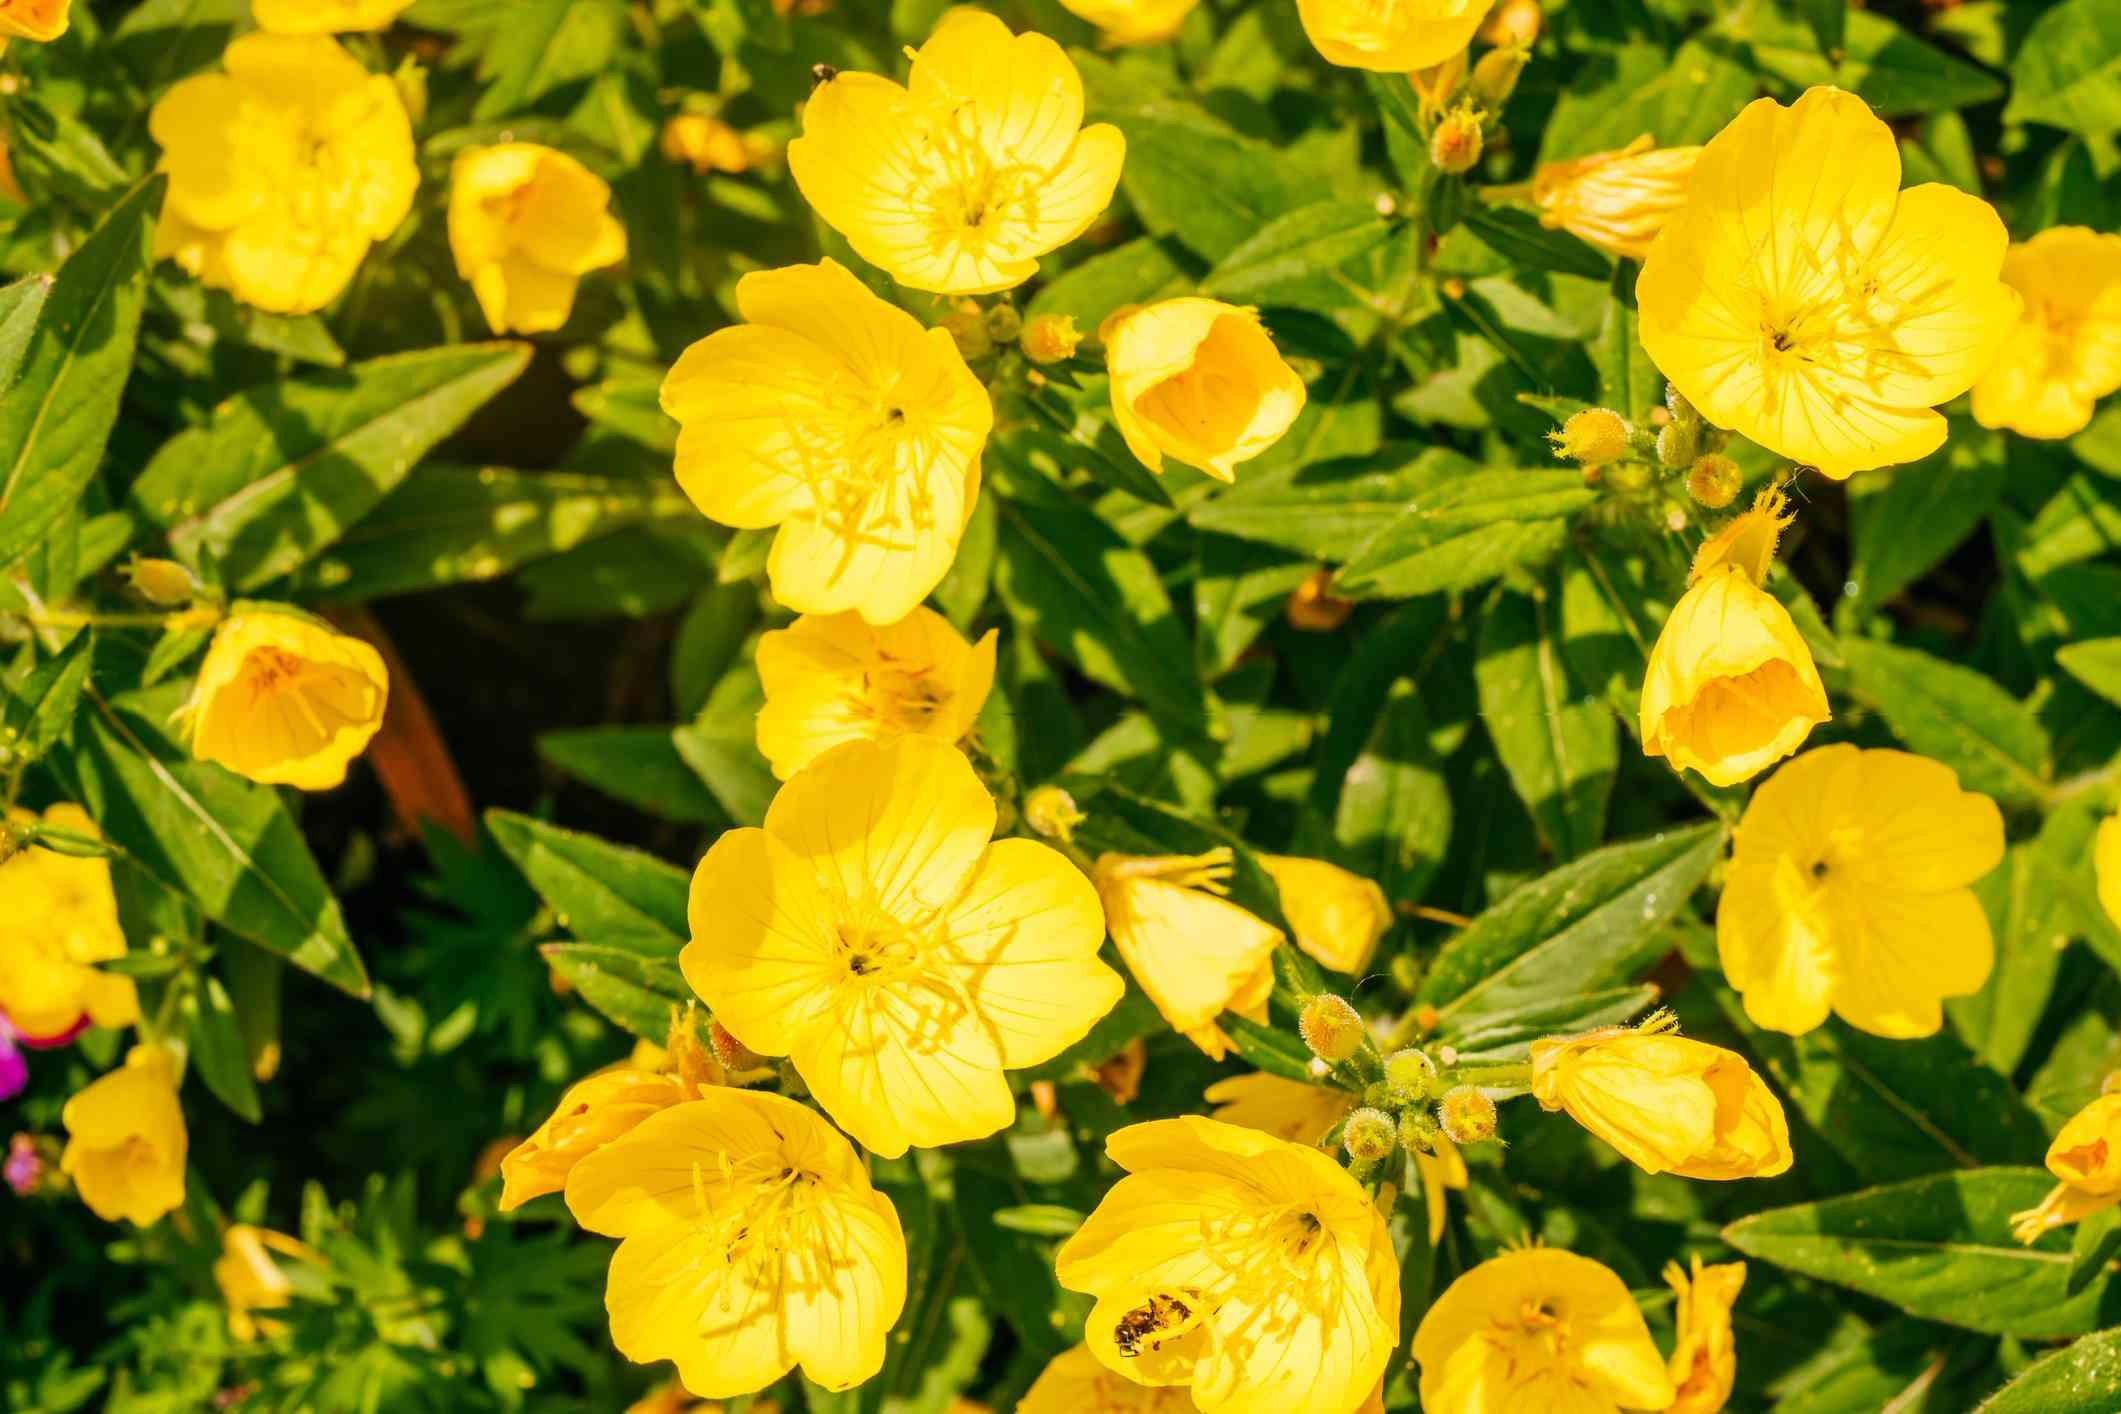 yellow common evening primrose blooming